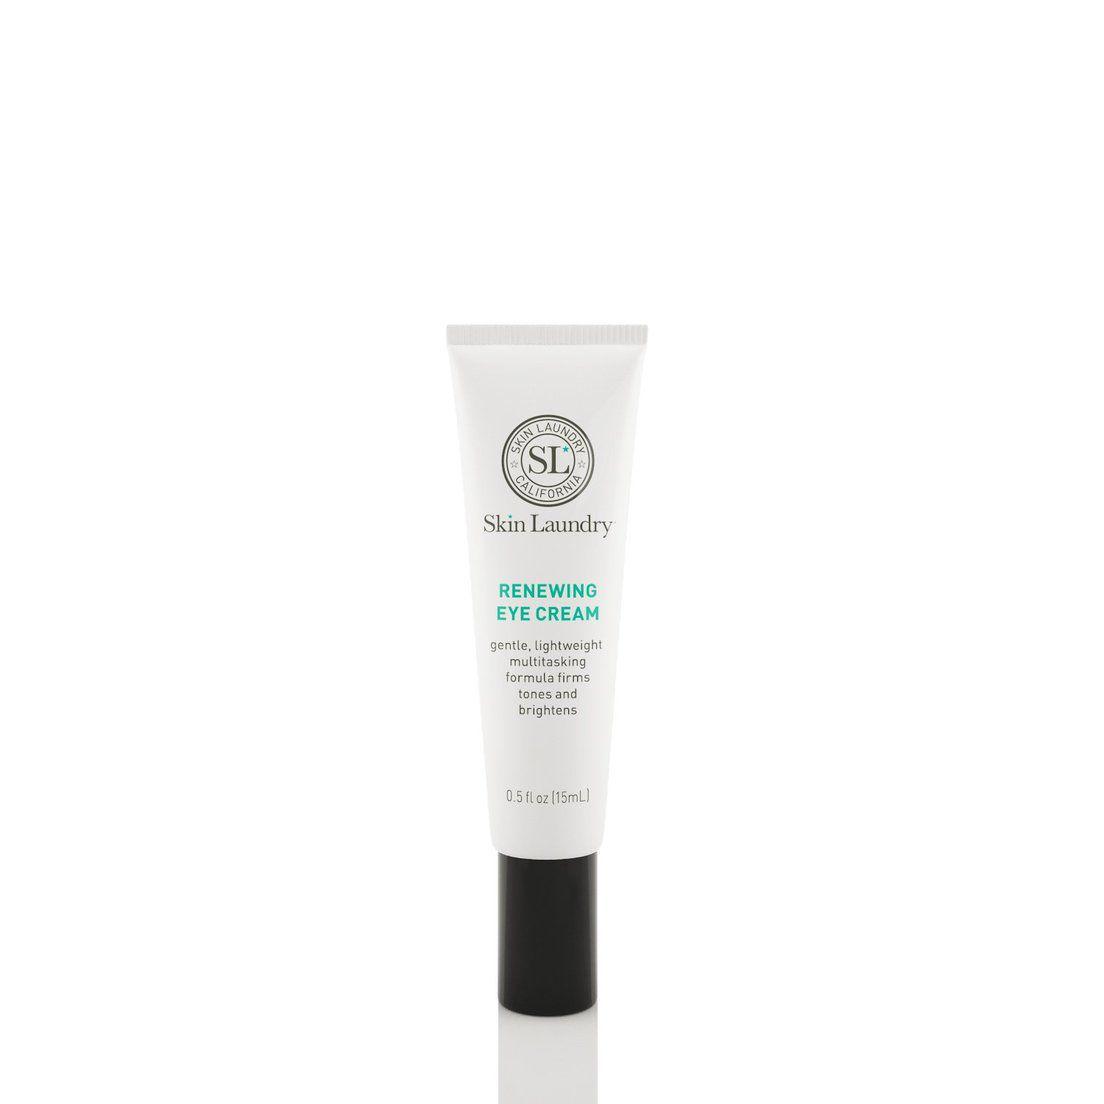 SL renewing eye cream